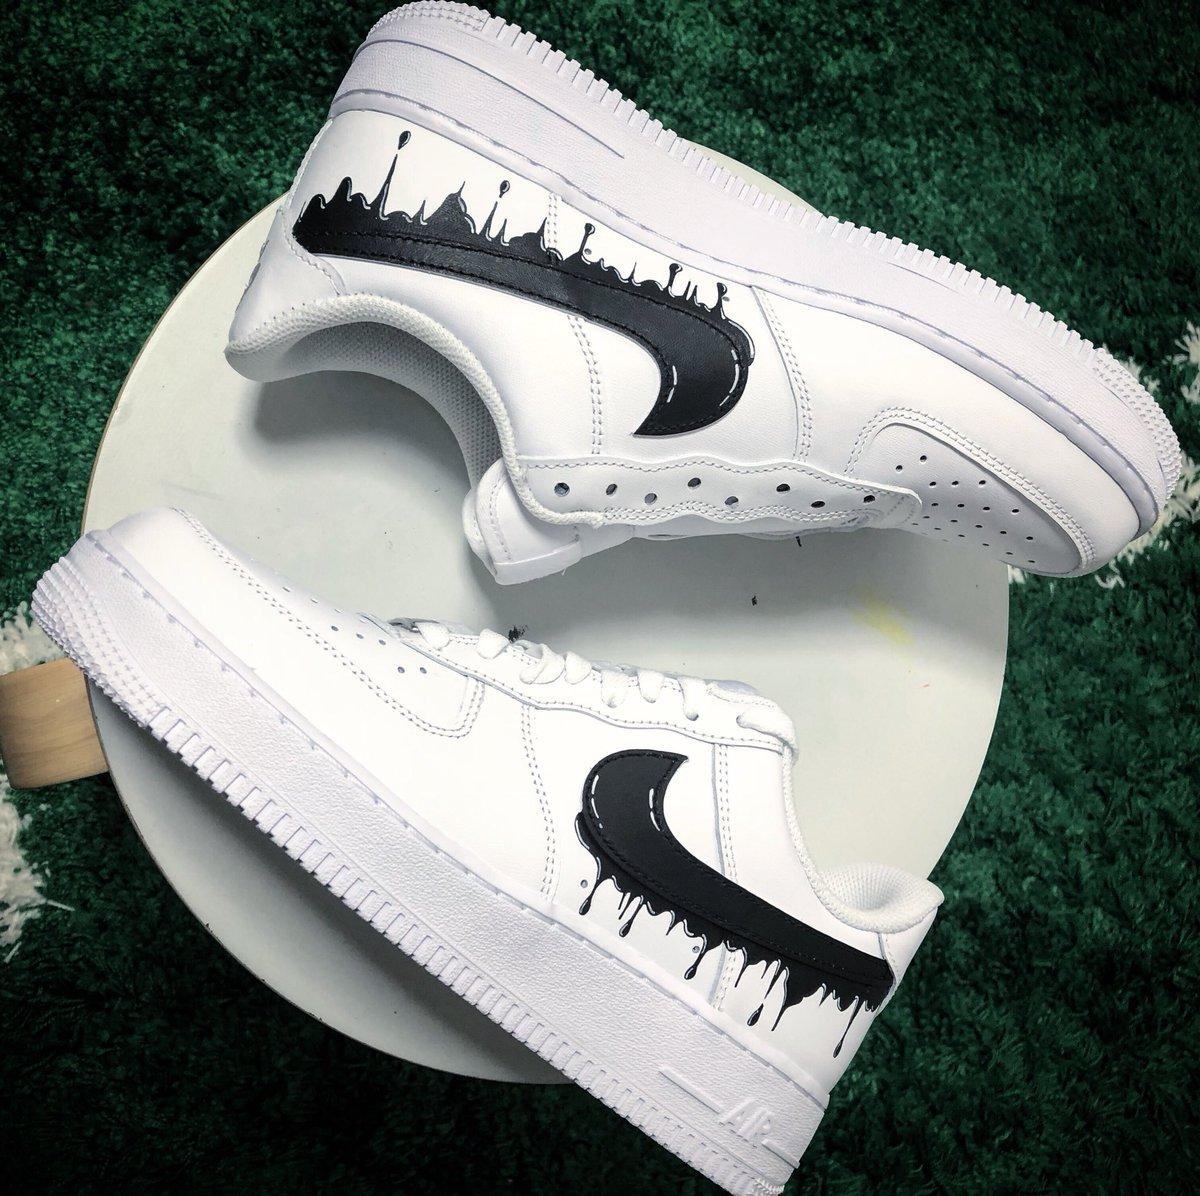 【YouTube】  Custom Air Force 1!👟🎨 (Dripping) 🤙https://t.co/GYPdfuiubJ🤙  近日新しい動画を公開予定です!!  #YouTube #sneaker #snkrs #sneakercustom #スニーカーカスタム #AirJordan1 #NIKE #airforce1 https://t.co/05284tlSJn